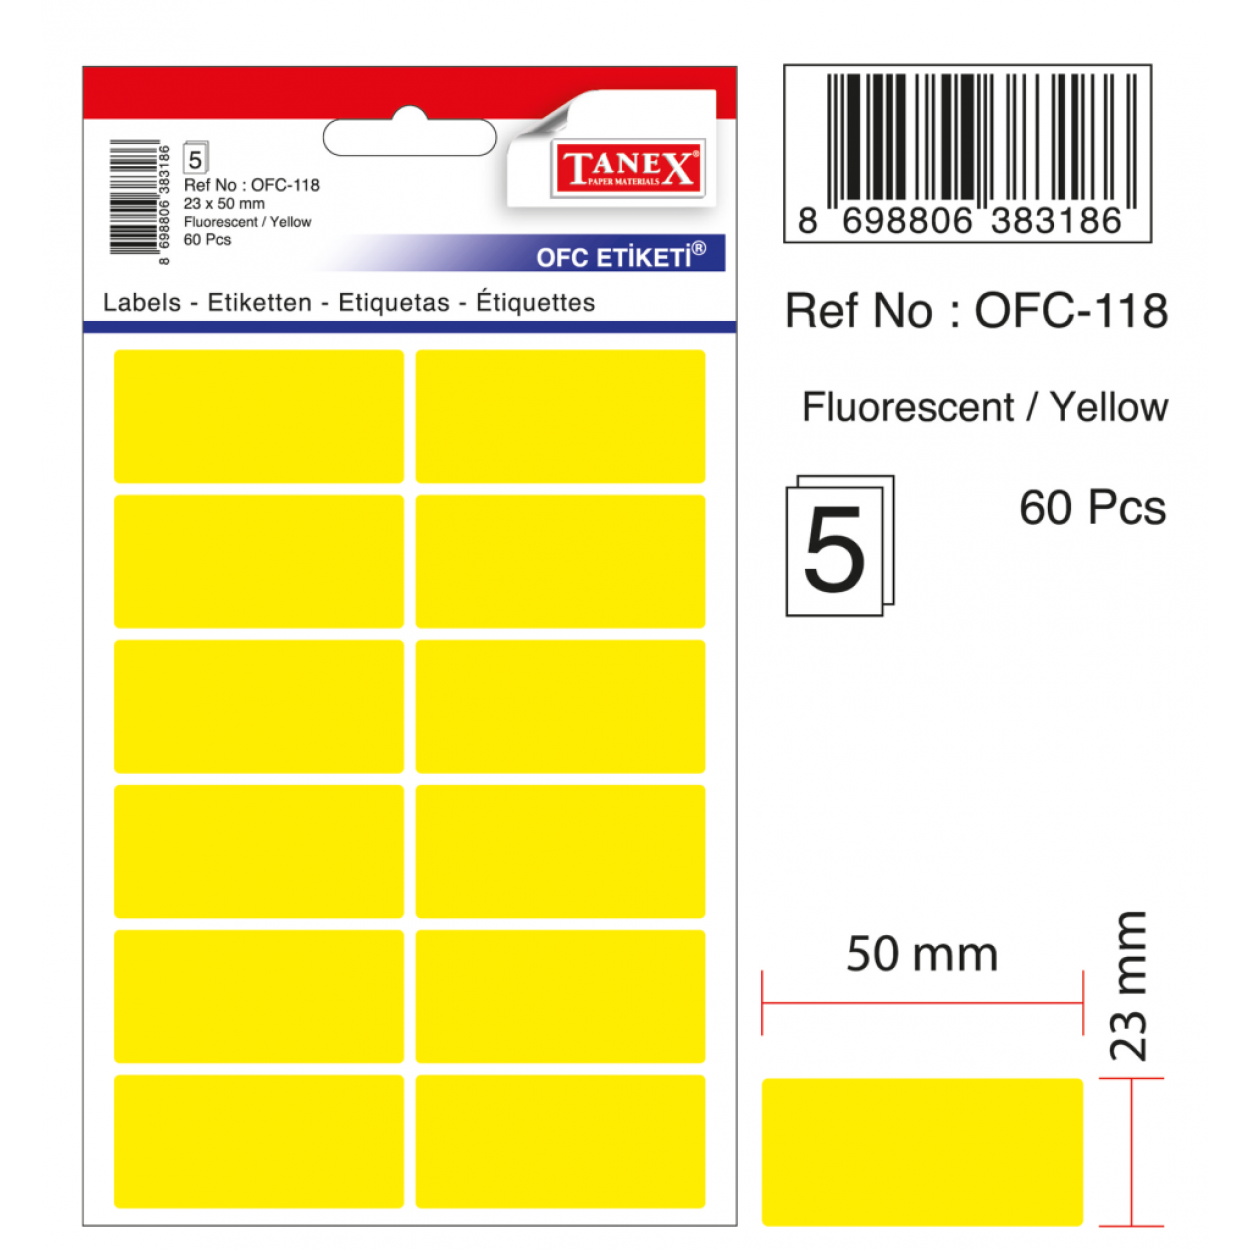 Tanex Ofc-118 Flo Sarı Ofis Etiketi